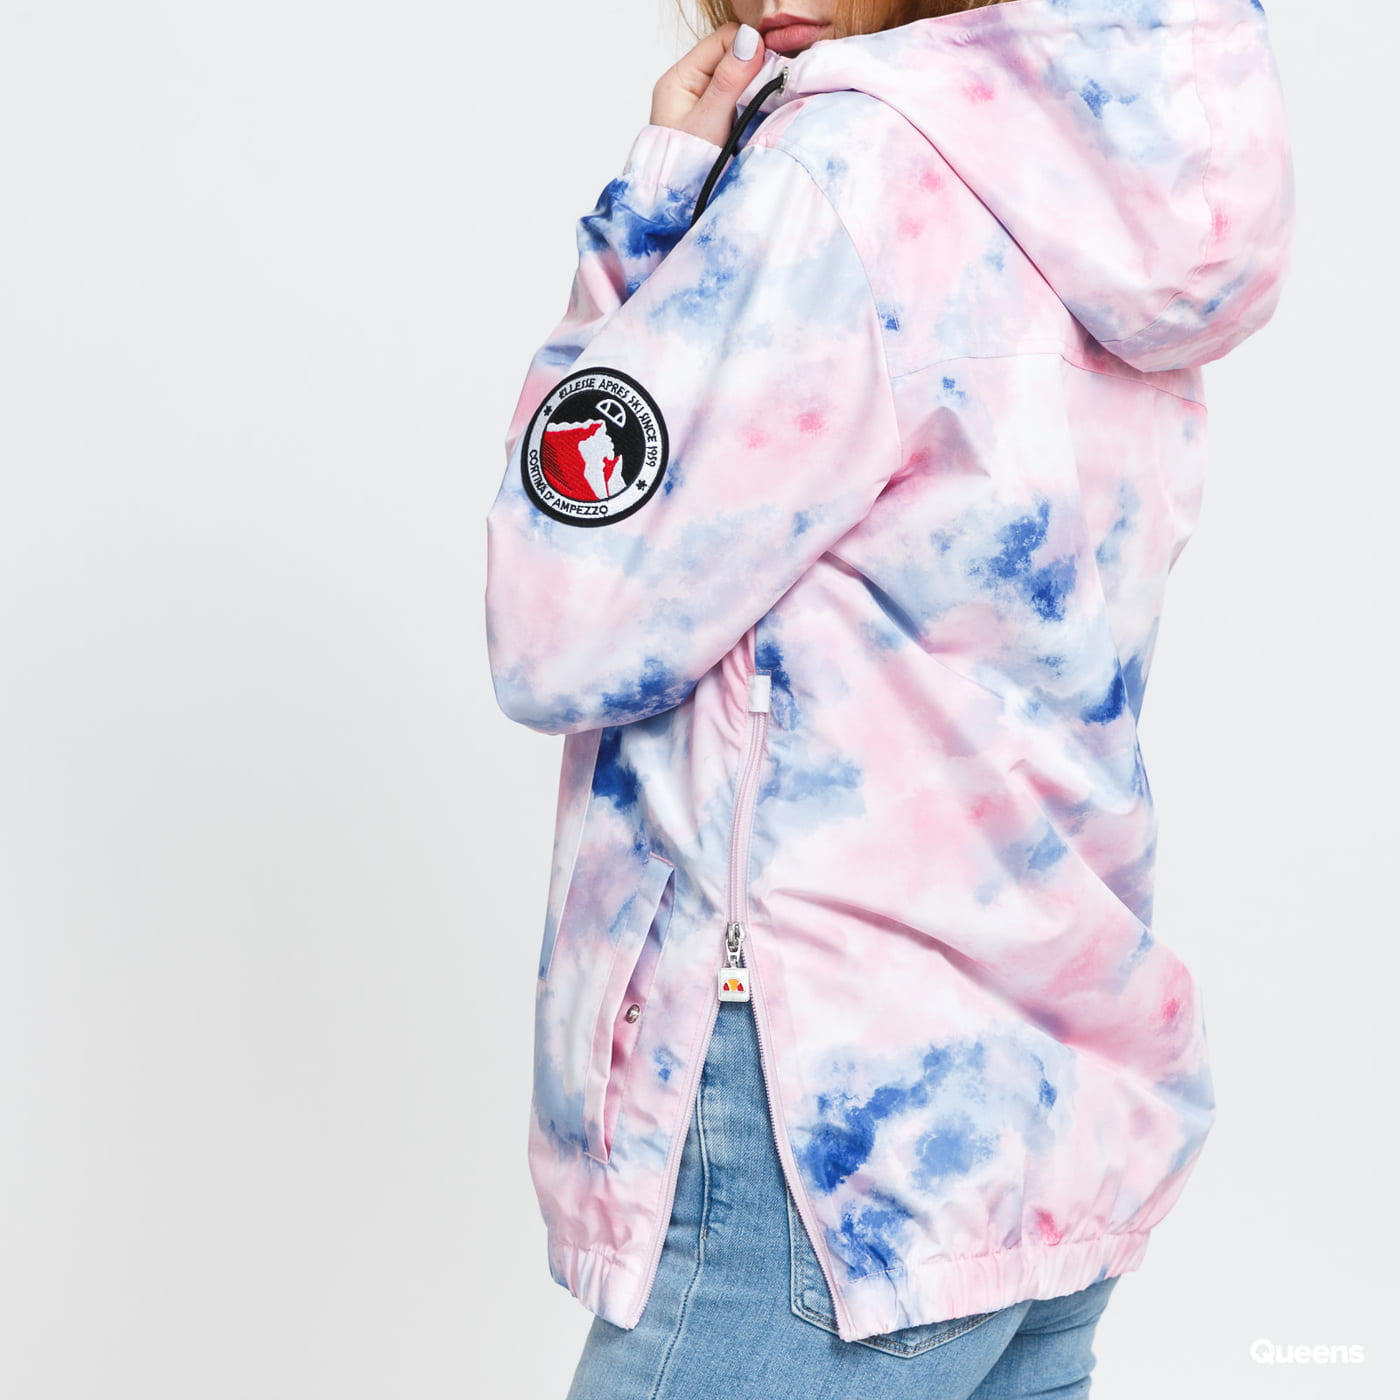 ellesse Montez Tie Dye Jacket pink / navy